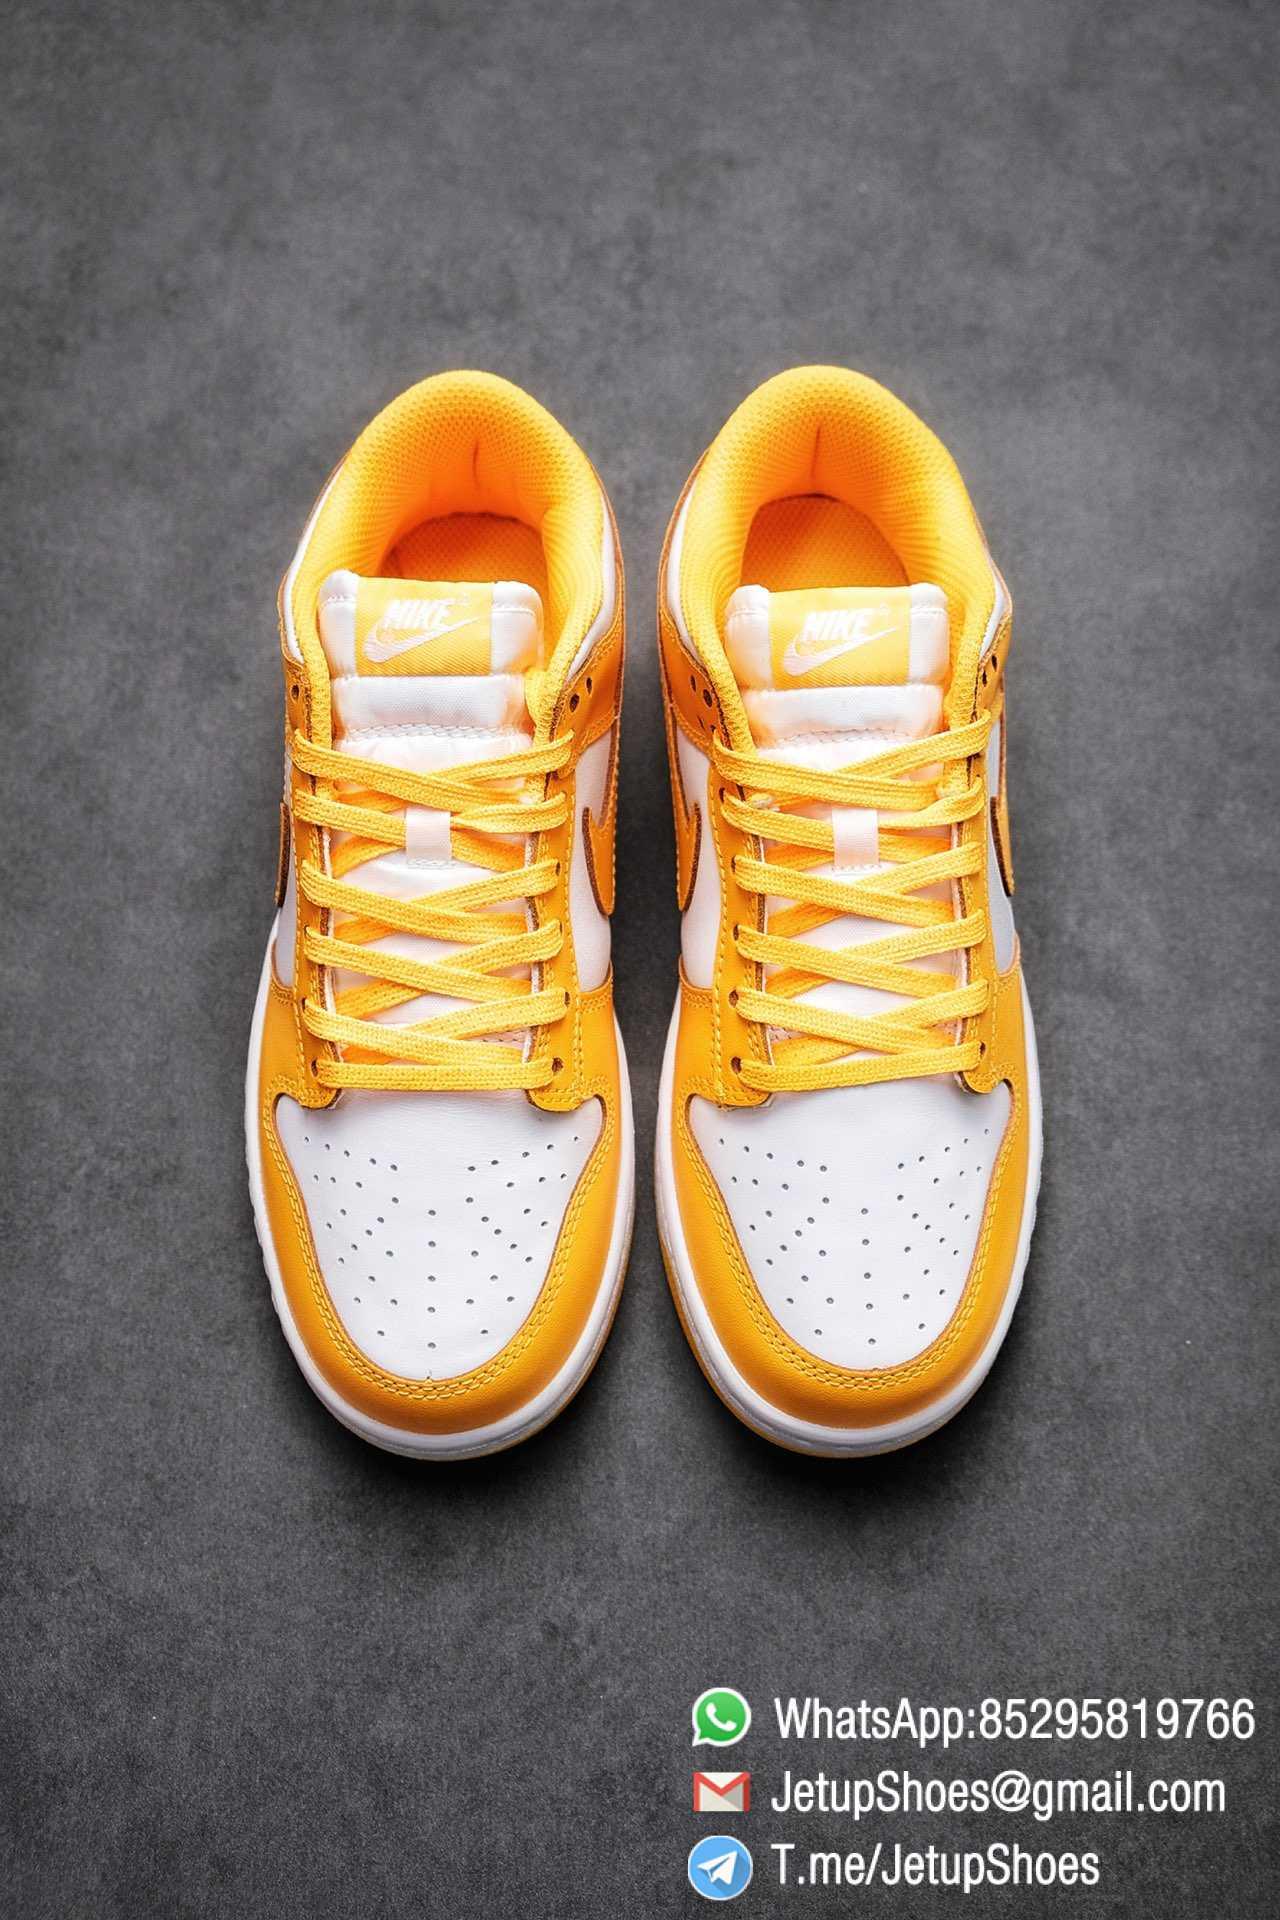 Womens Sneakers Replica Nike SB Dunk Low Laser Orange DD1503 800 Best RepSneakers 02